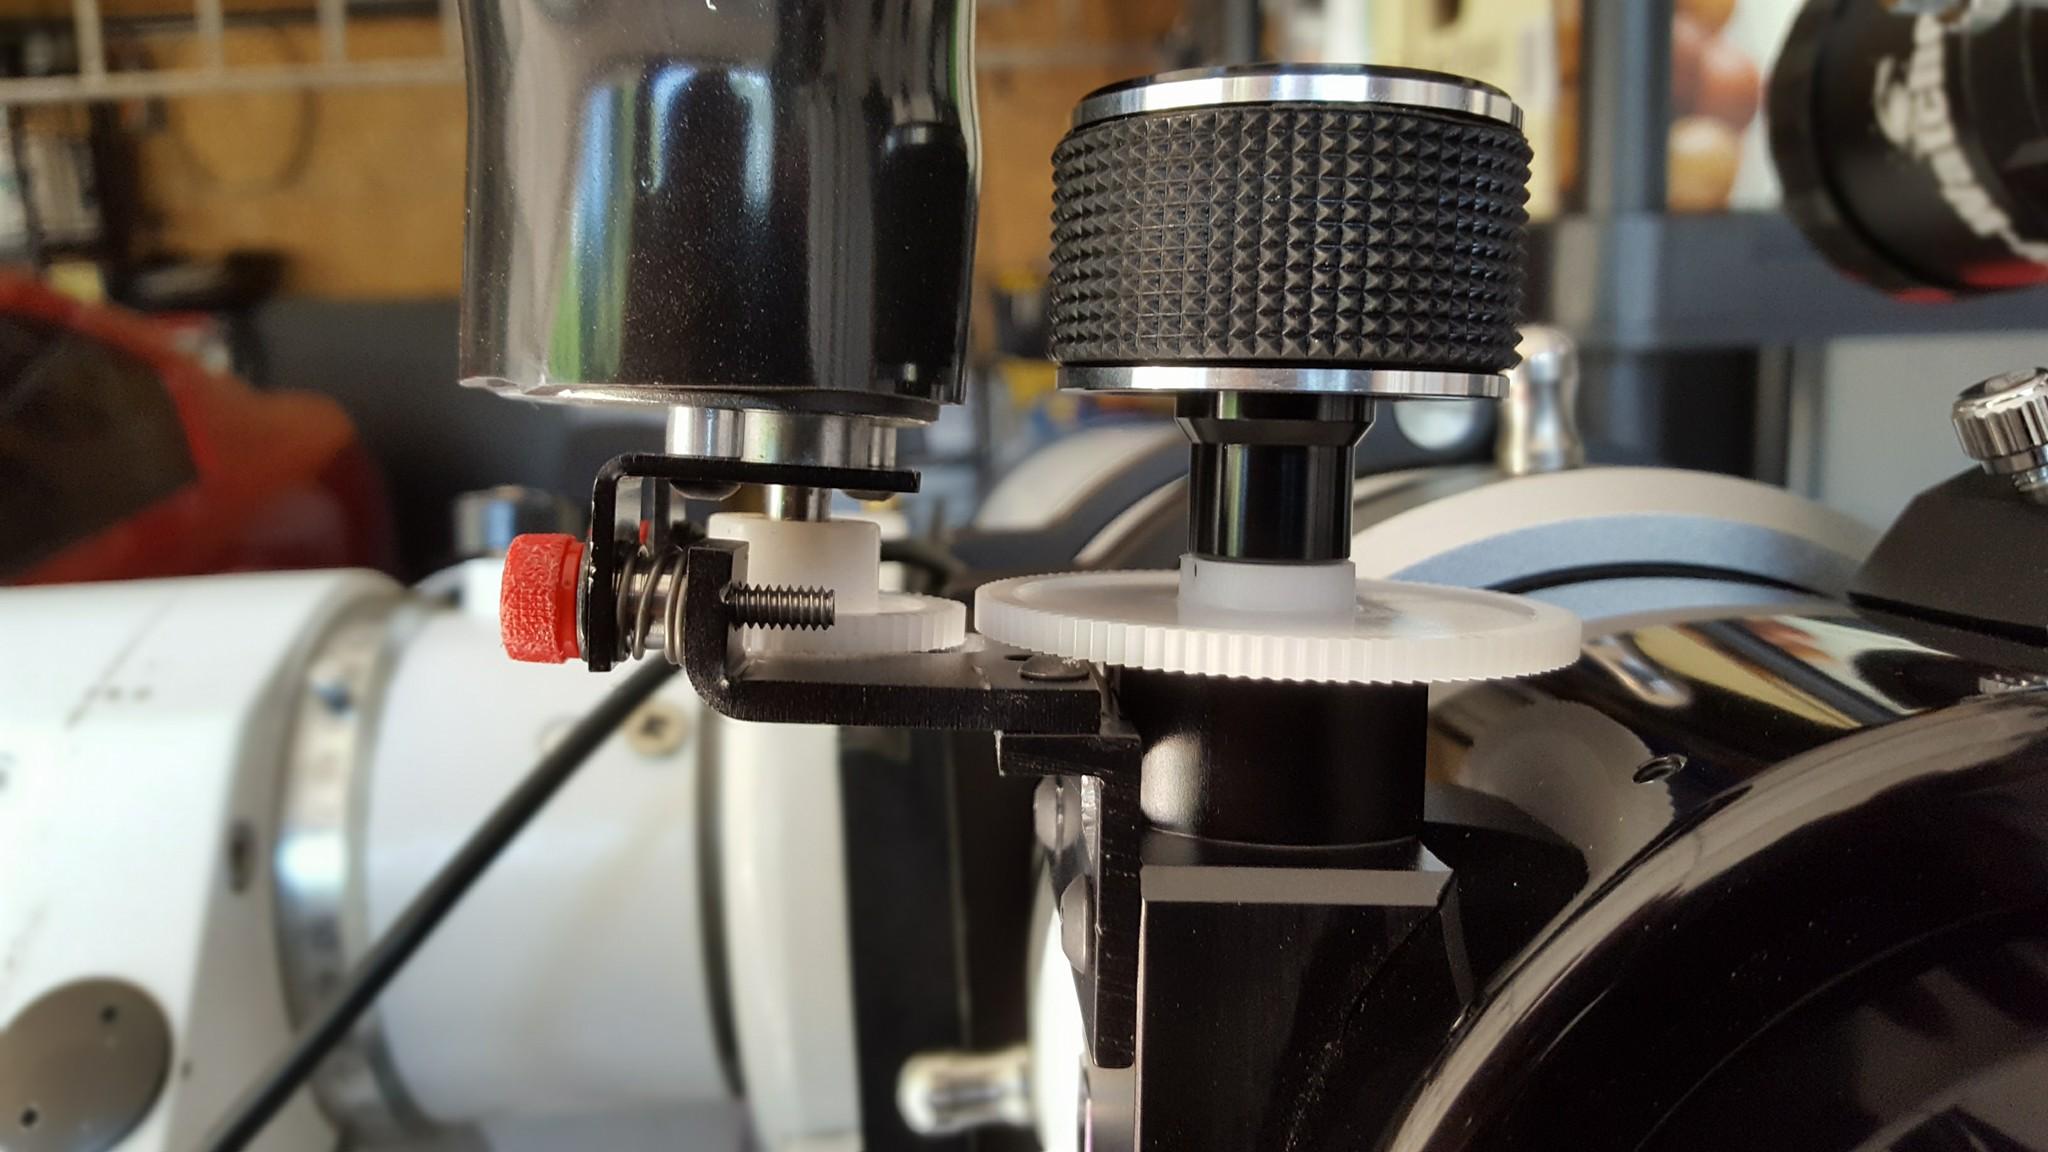 New hardware arrives for Rigel motorized focusing of Esprit 100